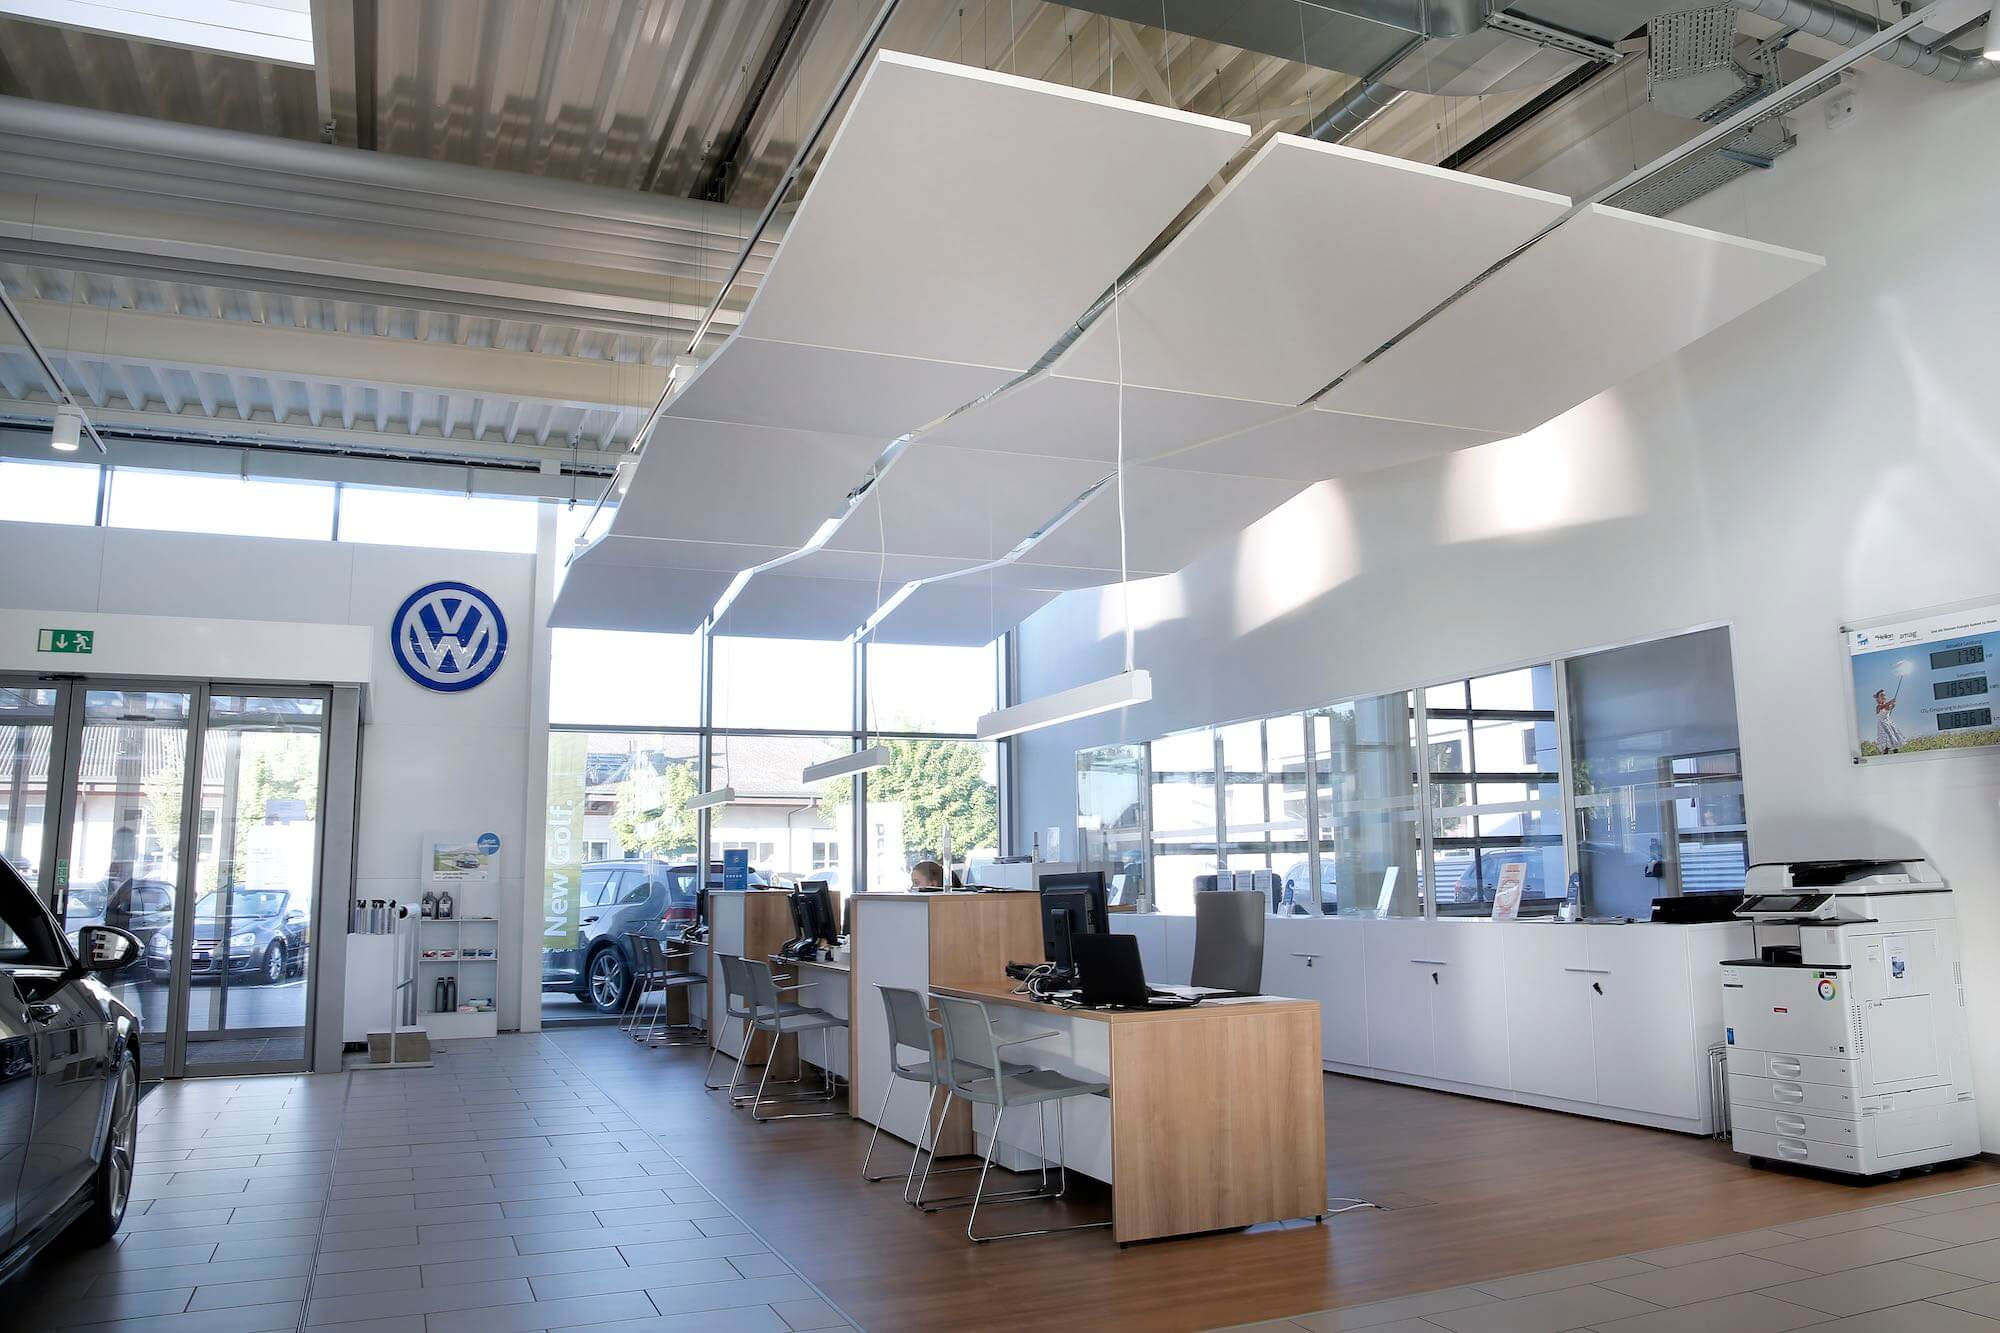 Akustikdecke im Verkaufsraum, Viktor Wyss AG in Flumenthal, Solothurn